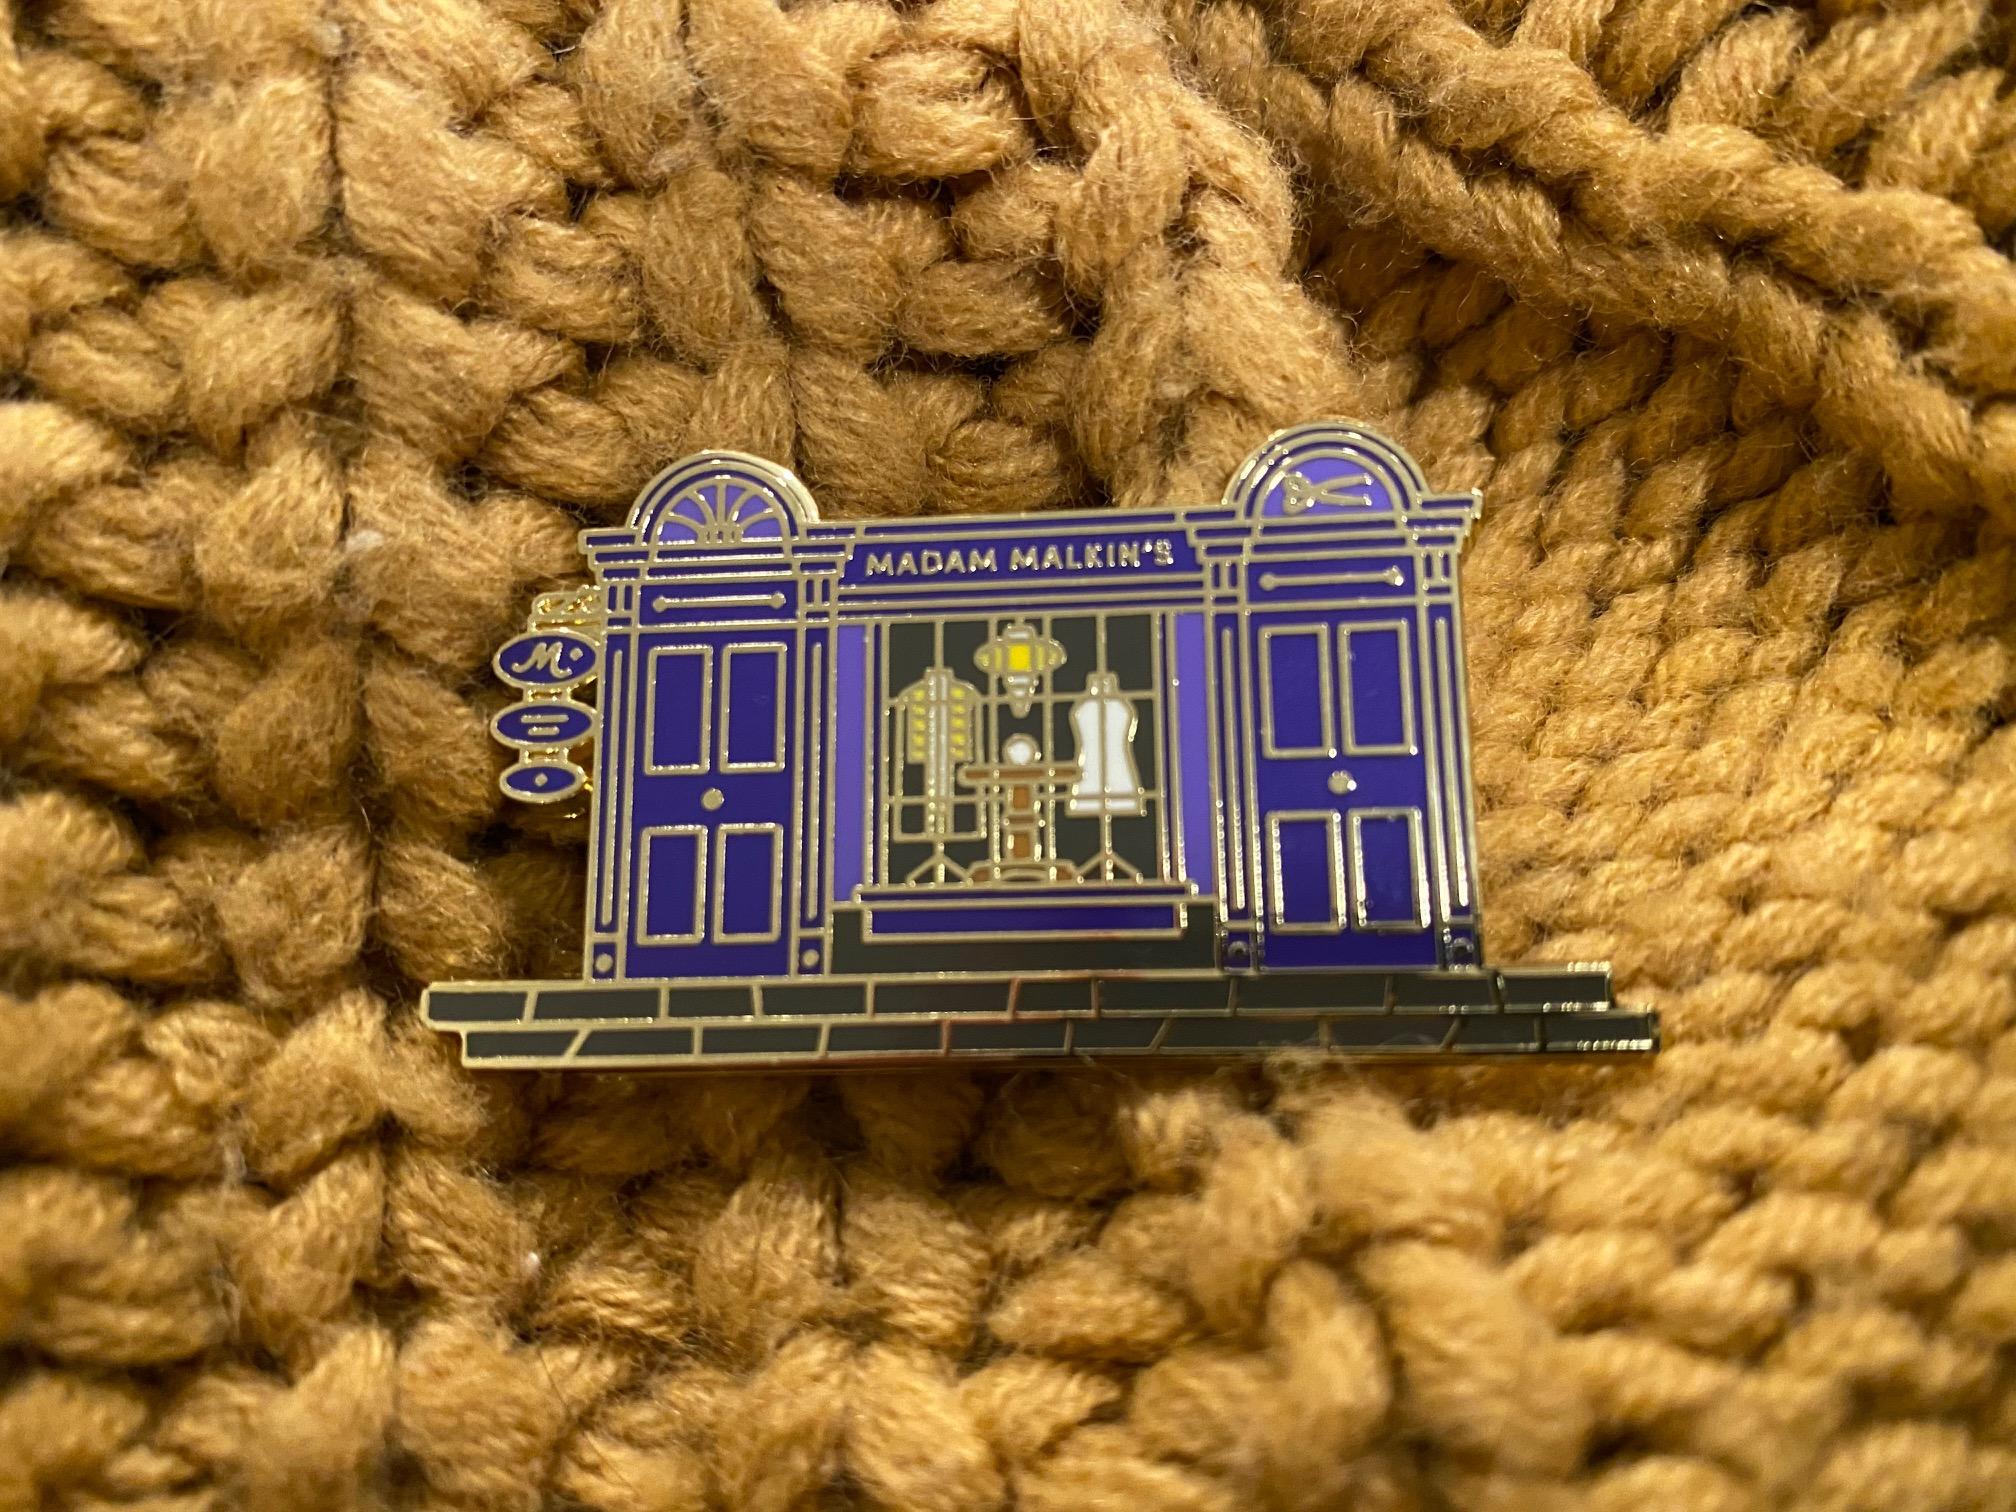 Madam Malkin's Pin